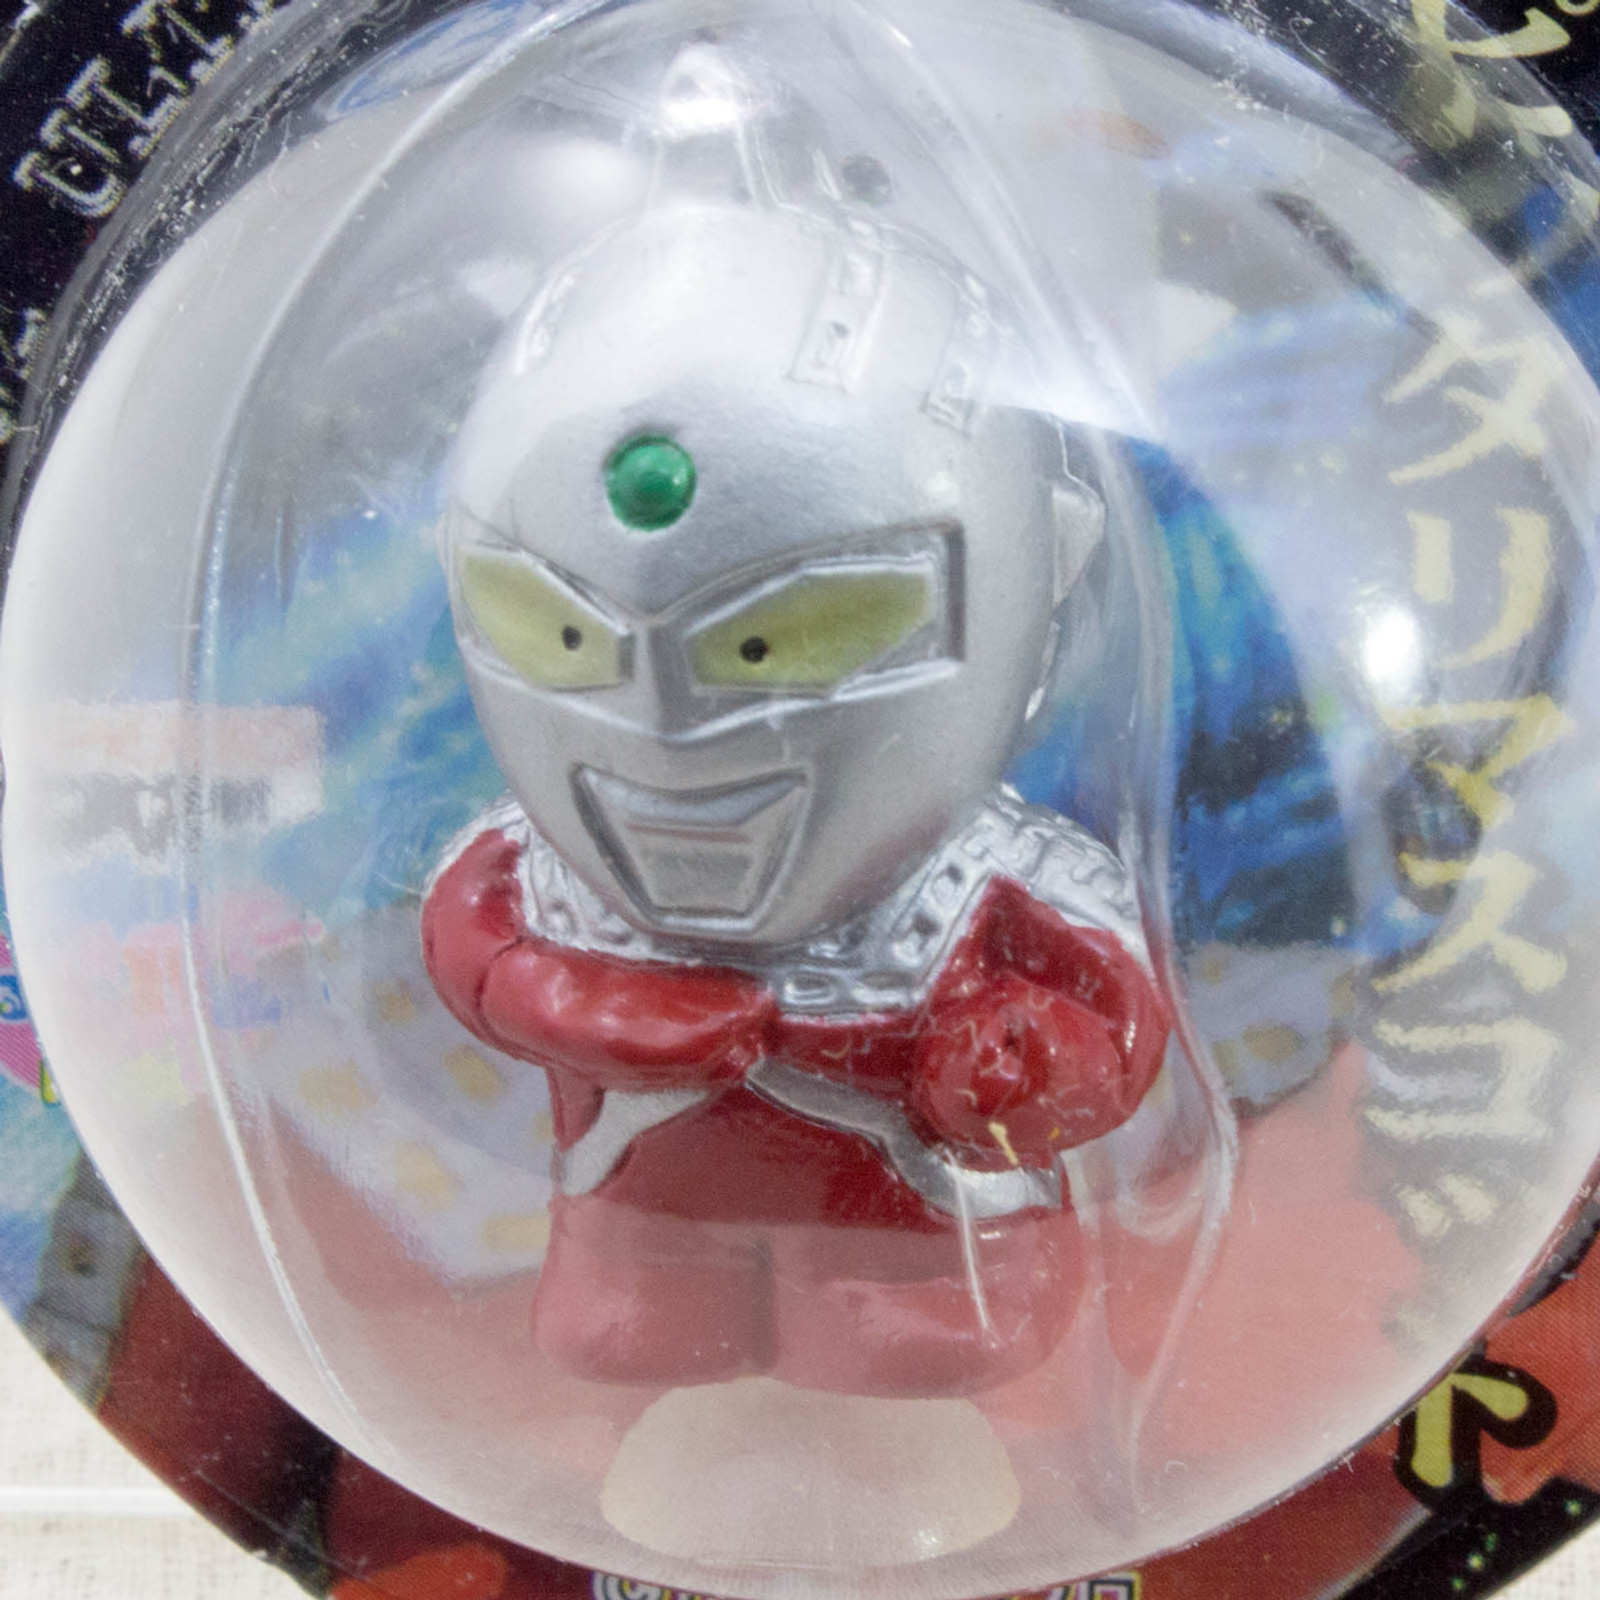 "Ultra Seven 1.2"" Mini Figure with Sucker Tsuburaya JAPAN TOKUSATSU ANIME"